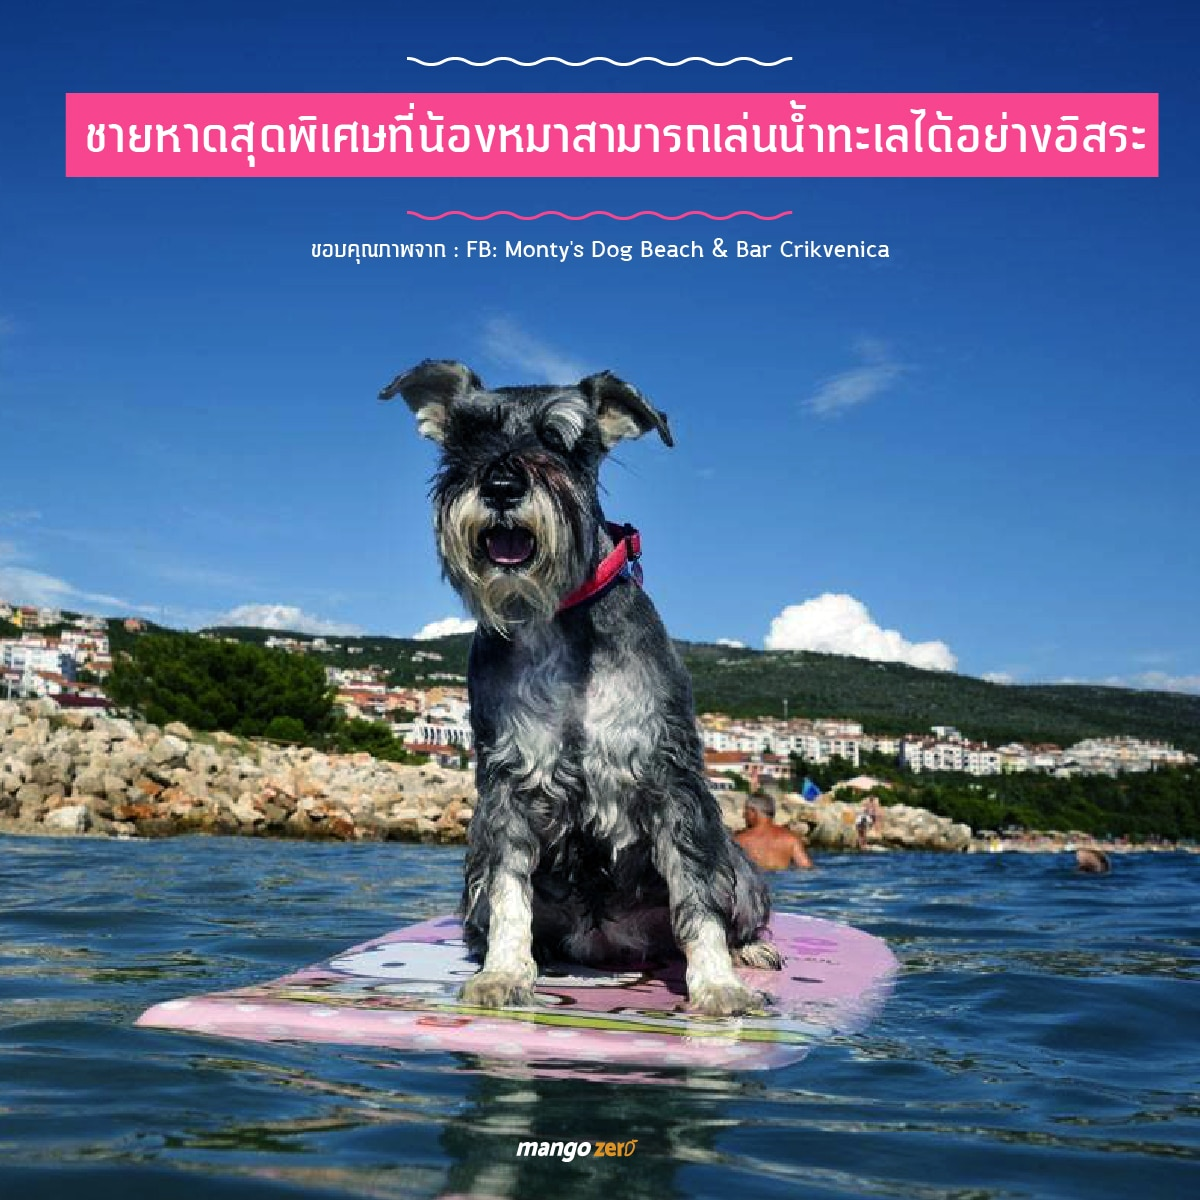 montys-dog-beach-bar-05